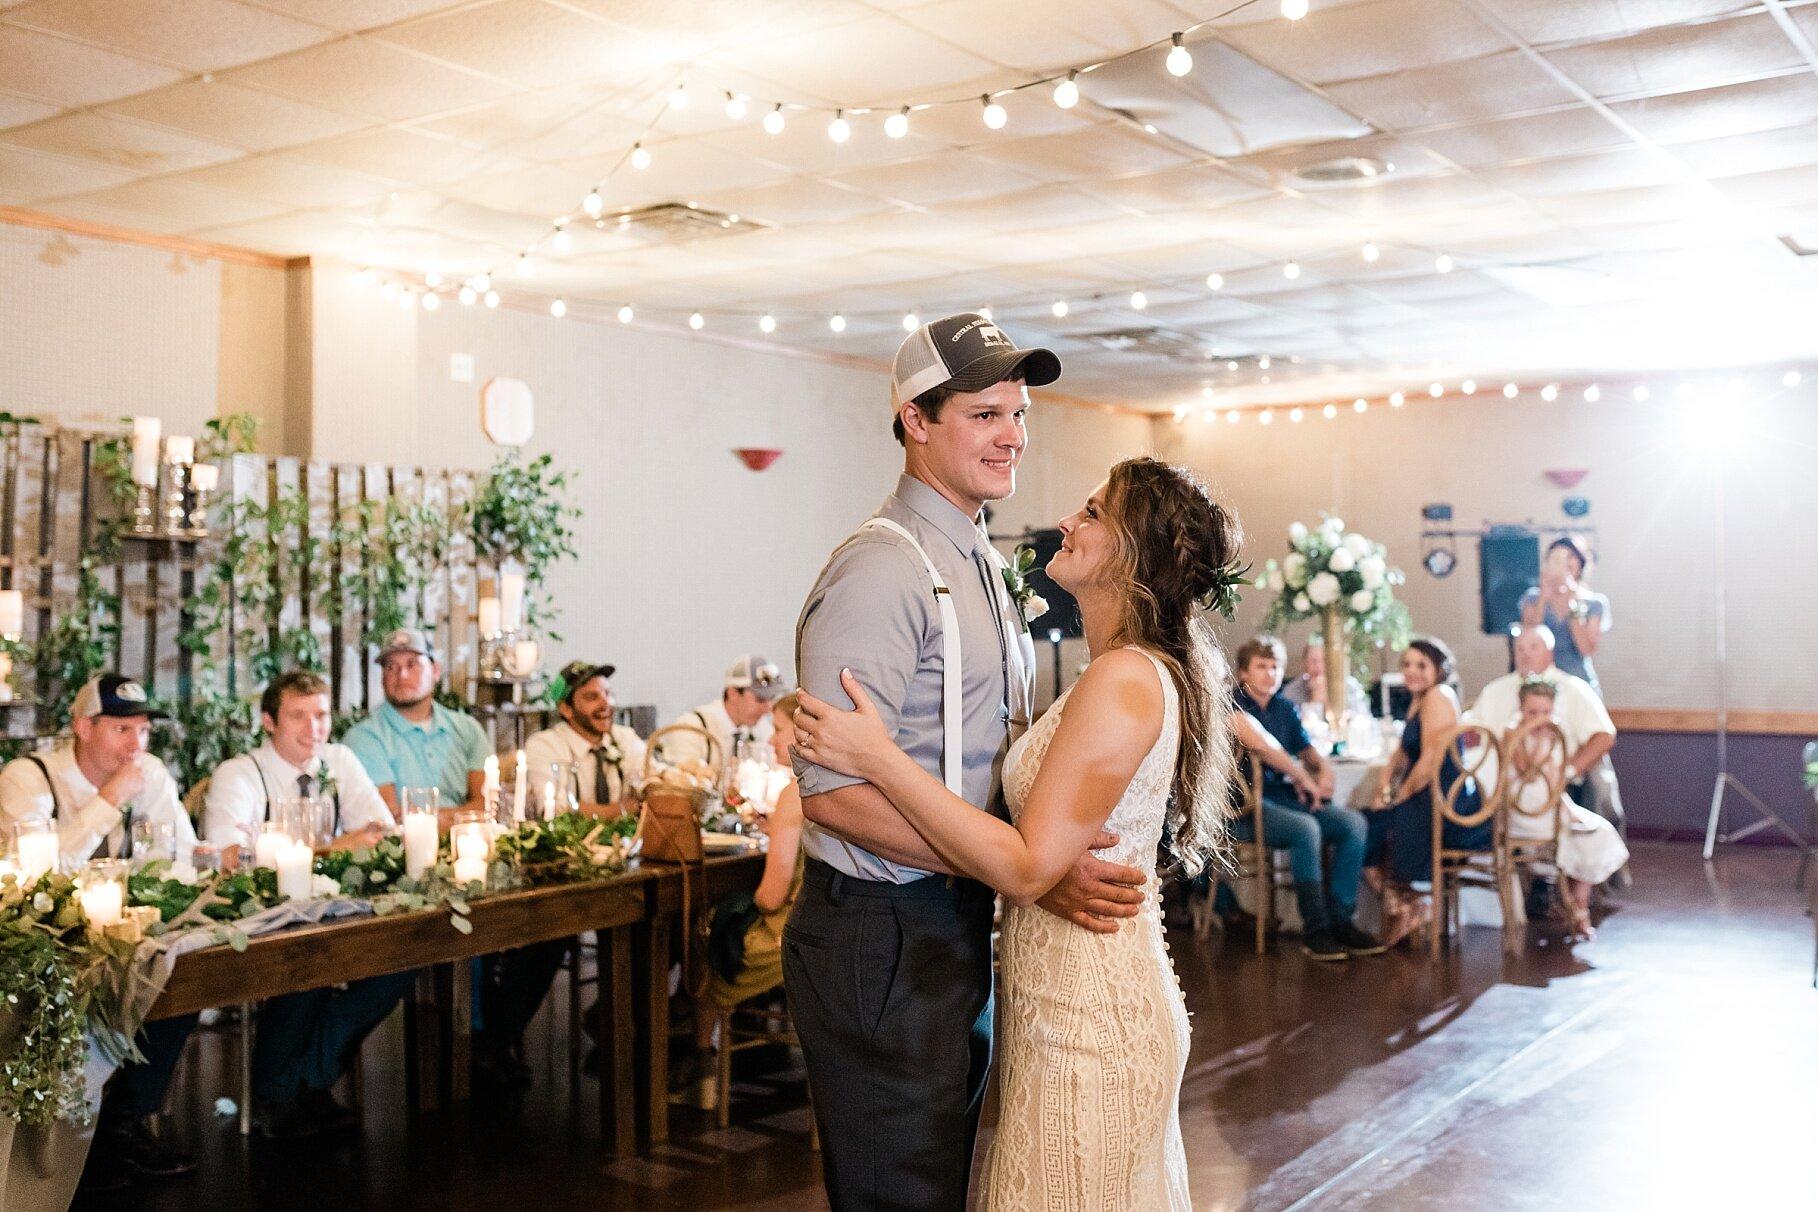 Earth-Toned Wedding by KKP Associate Wedding Photographer and Kelsi Kliethermes Photography Best Columbia Missouri Wedding Photographer_0014.jpg